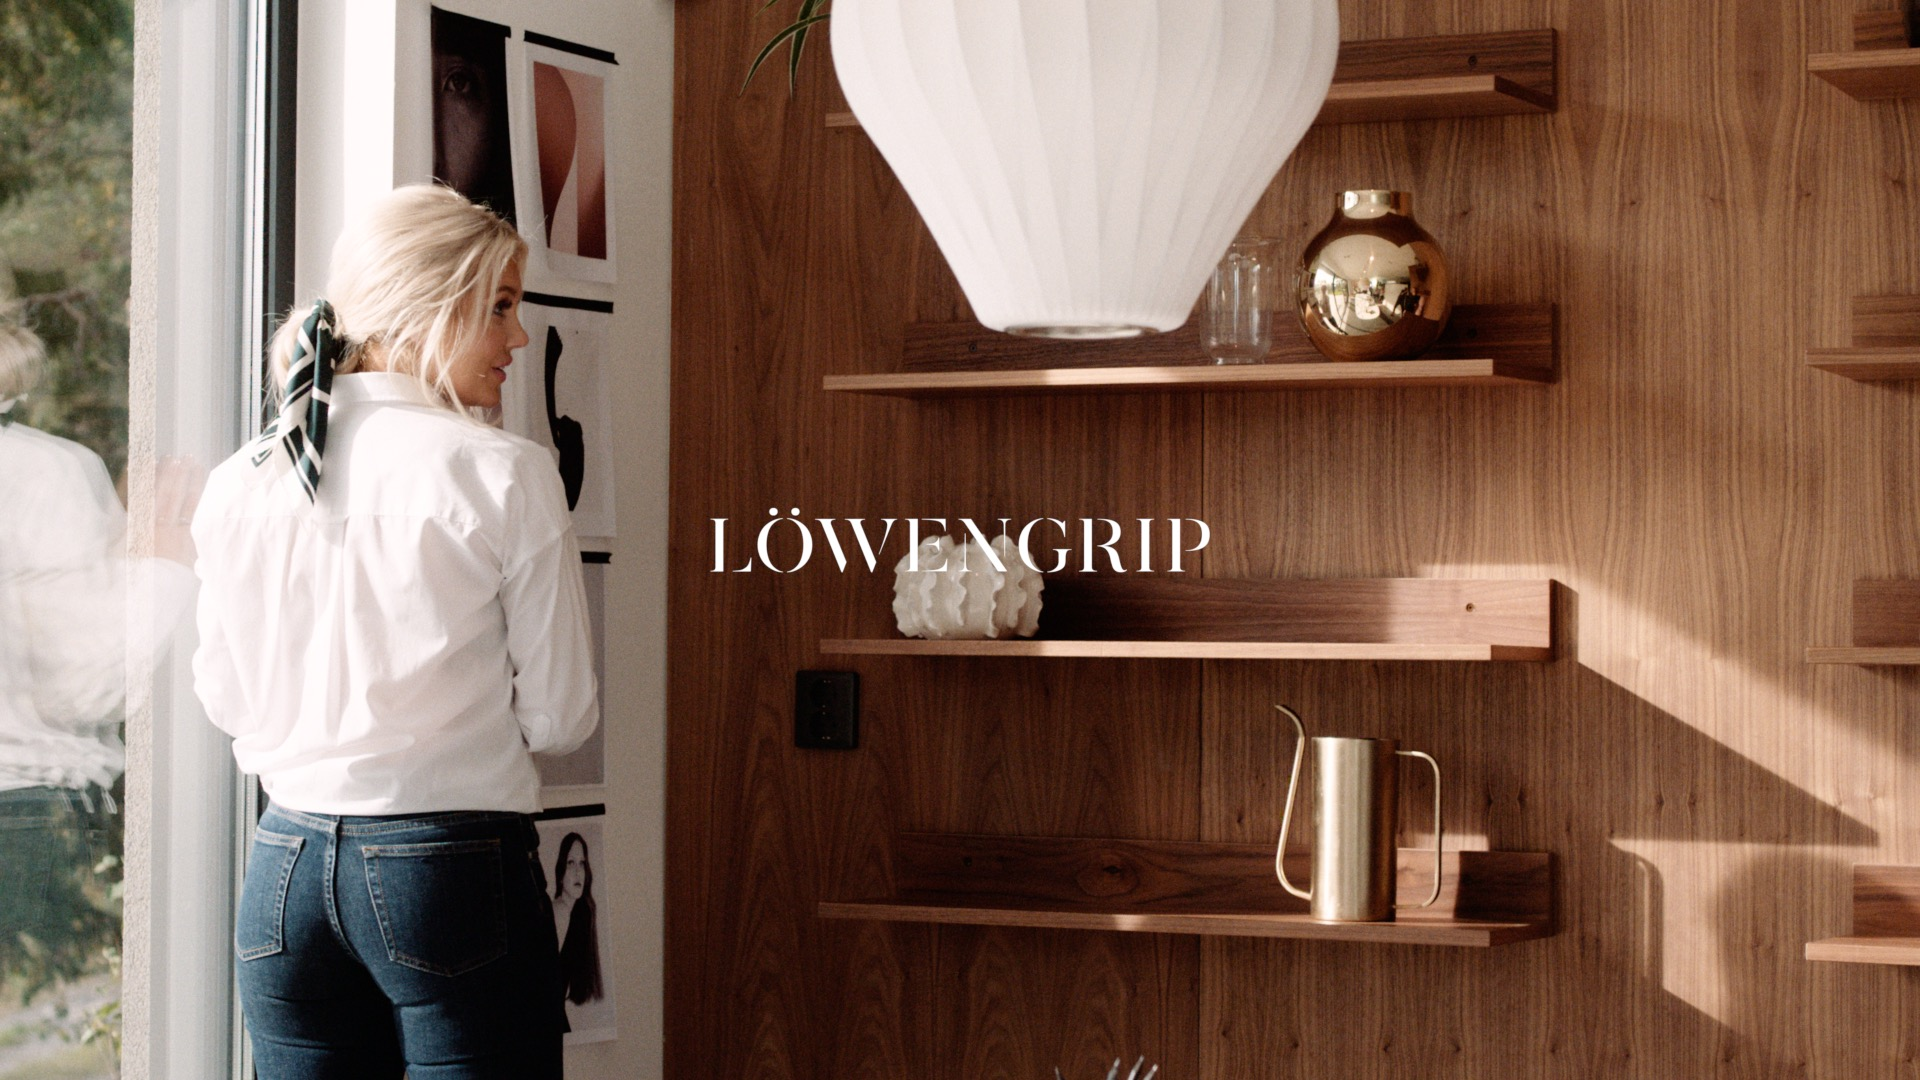 Löwengrip - Brand film 2.jpg